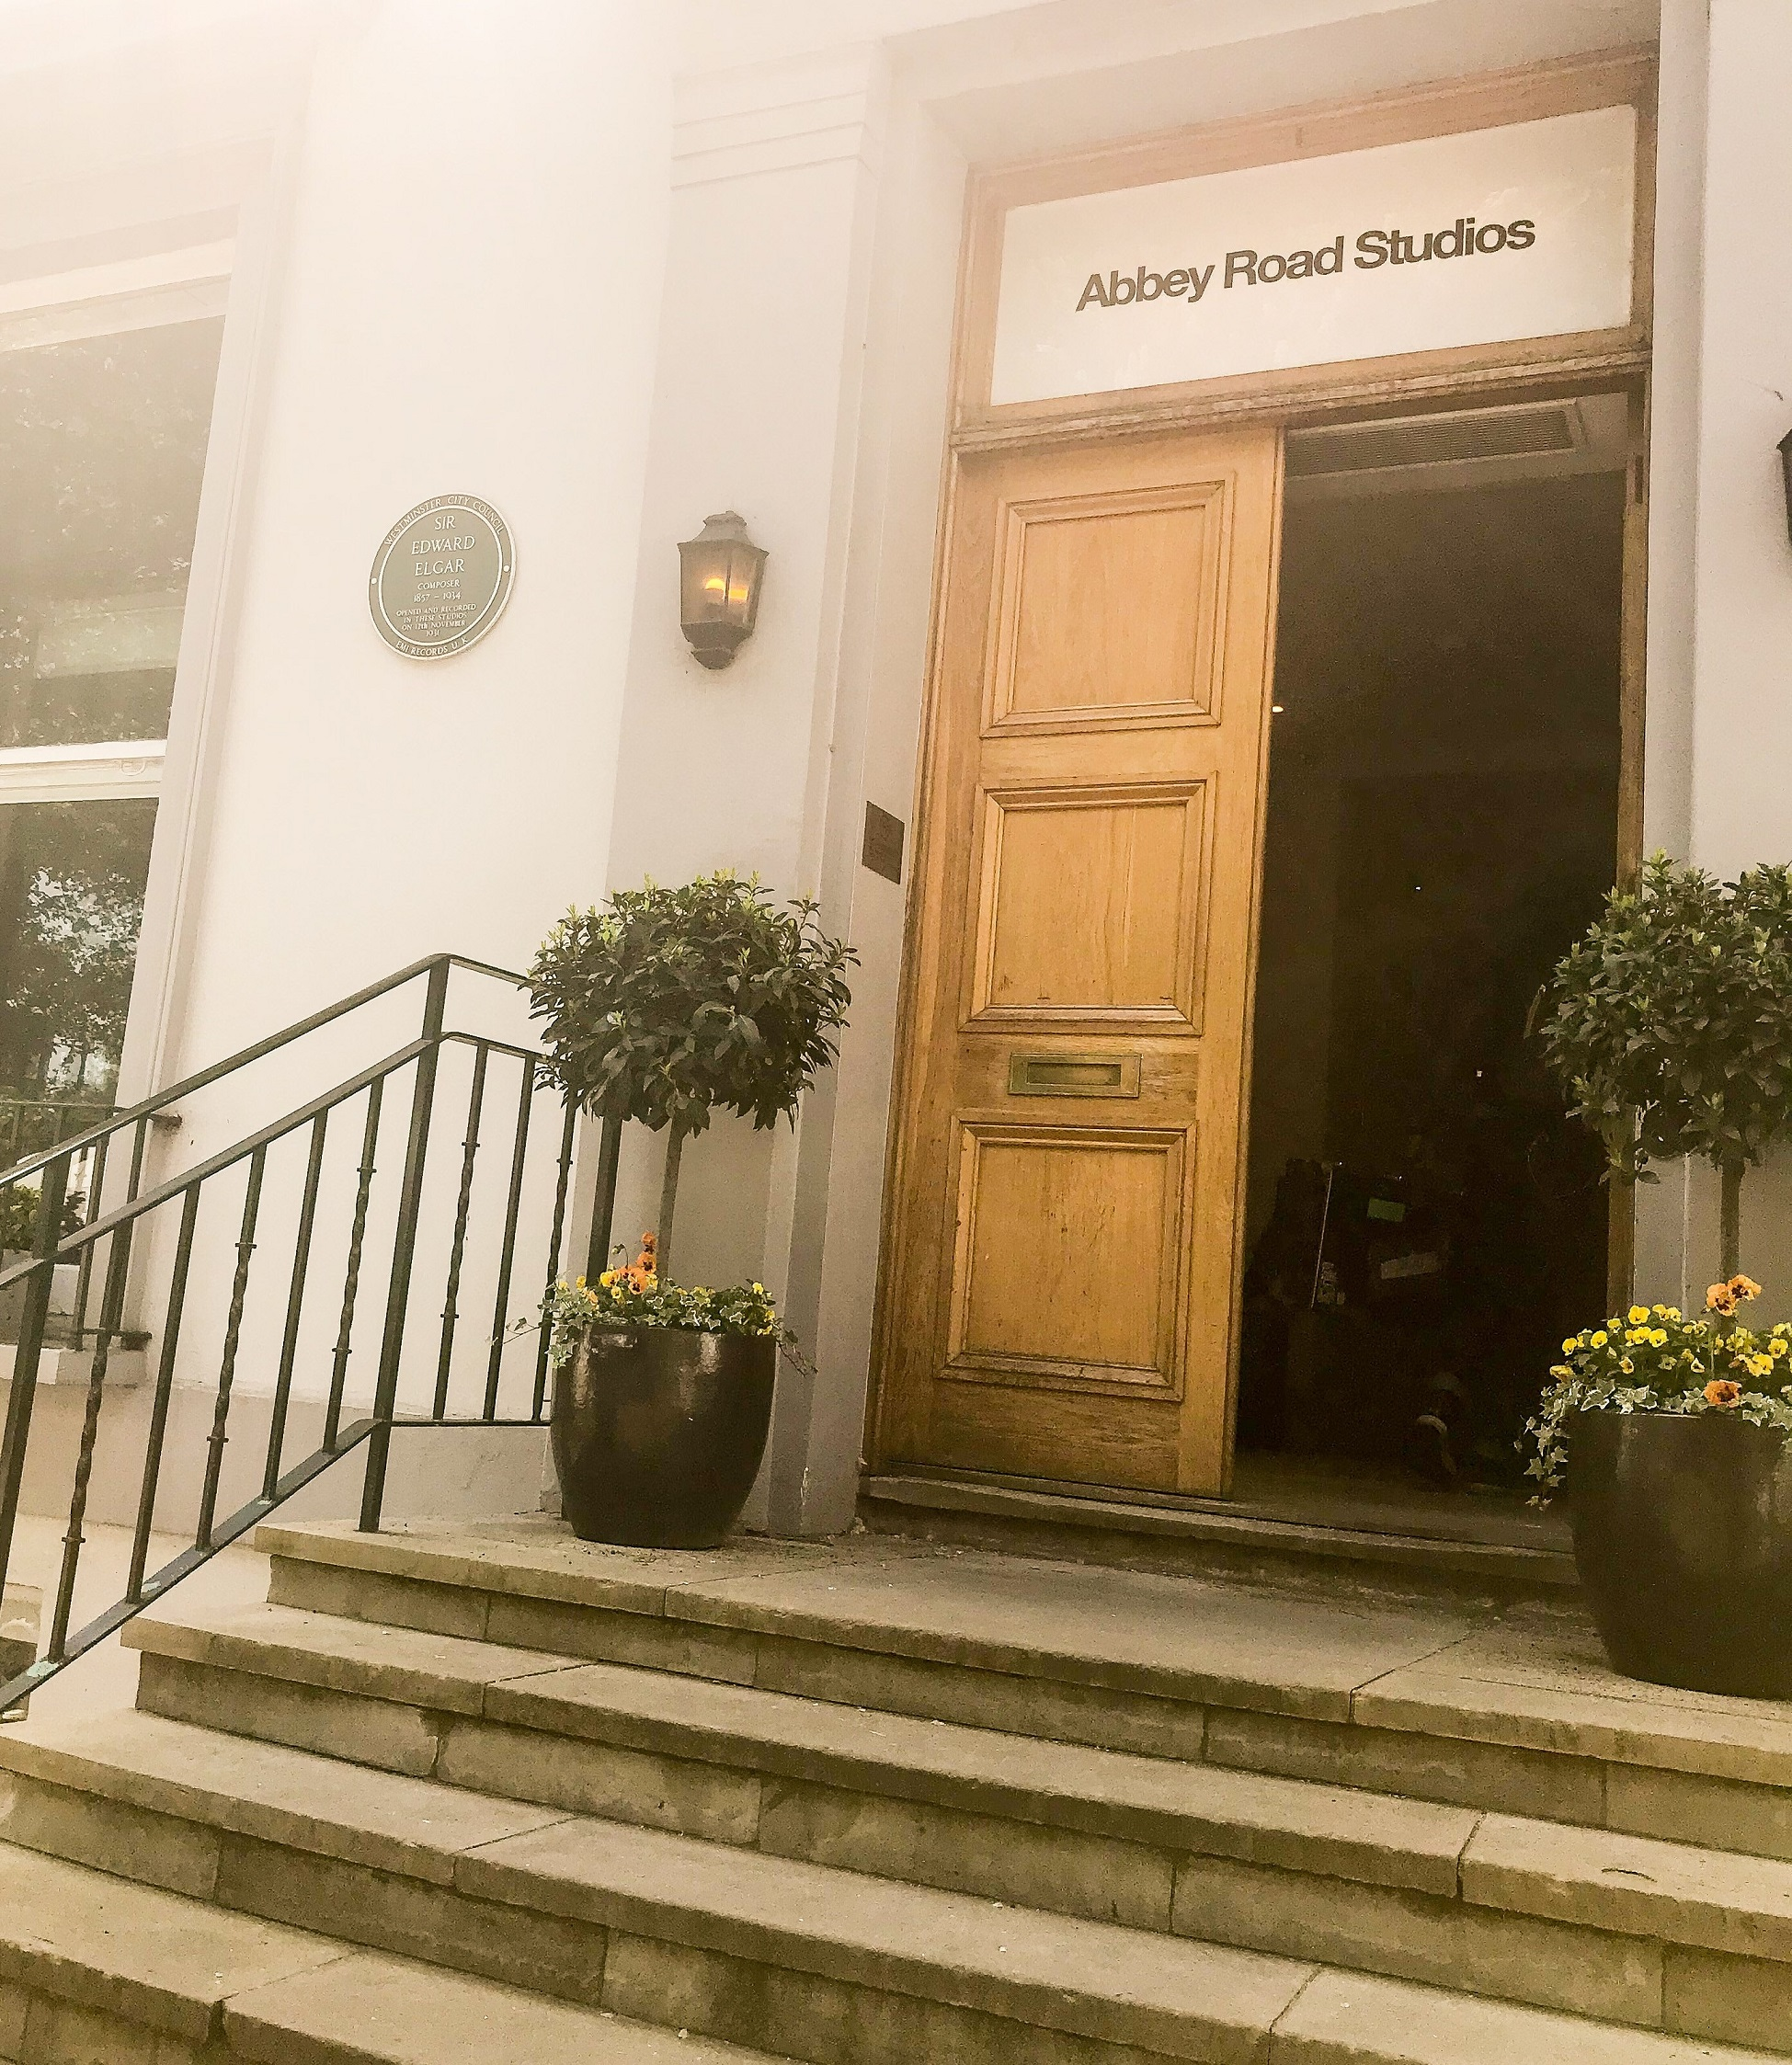 everis utilities event at Abbey Road Studios.